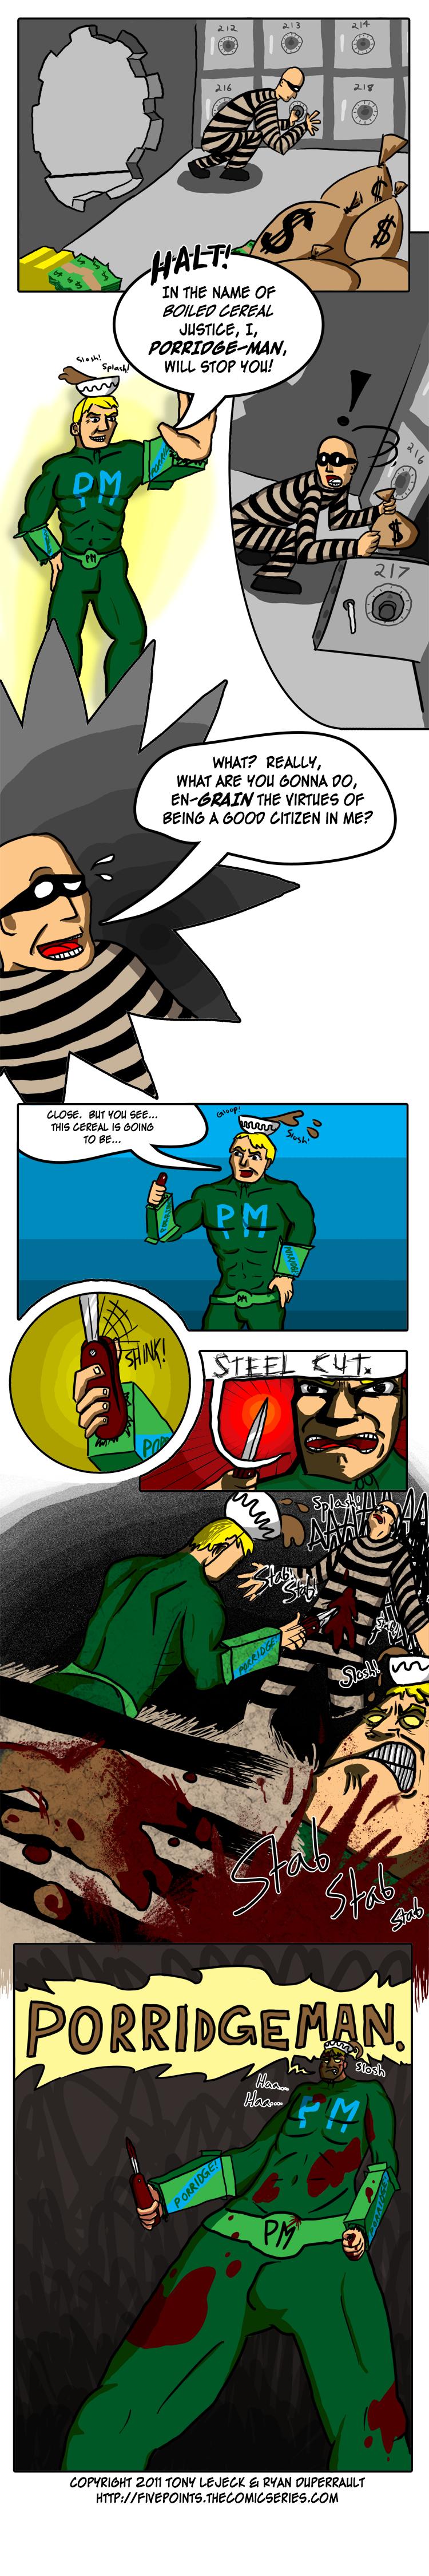 PORRIDGE-MAN